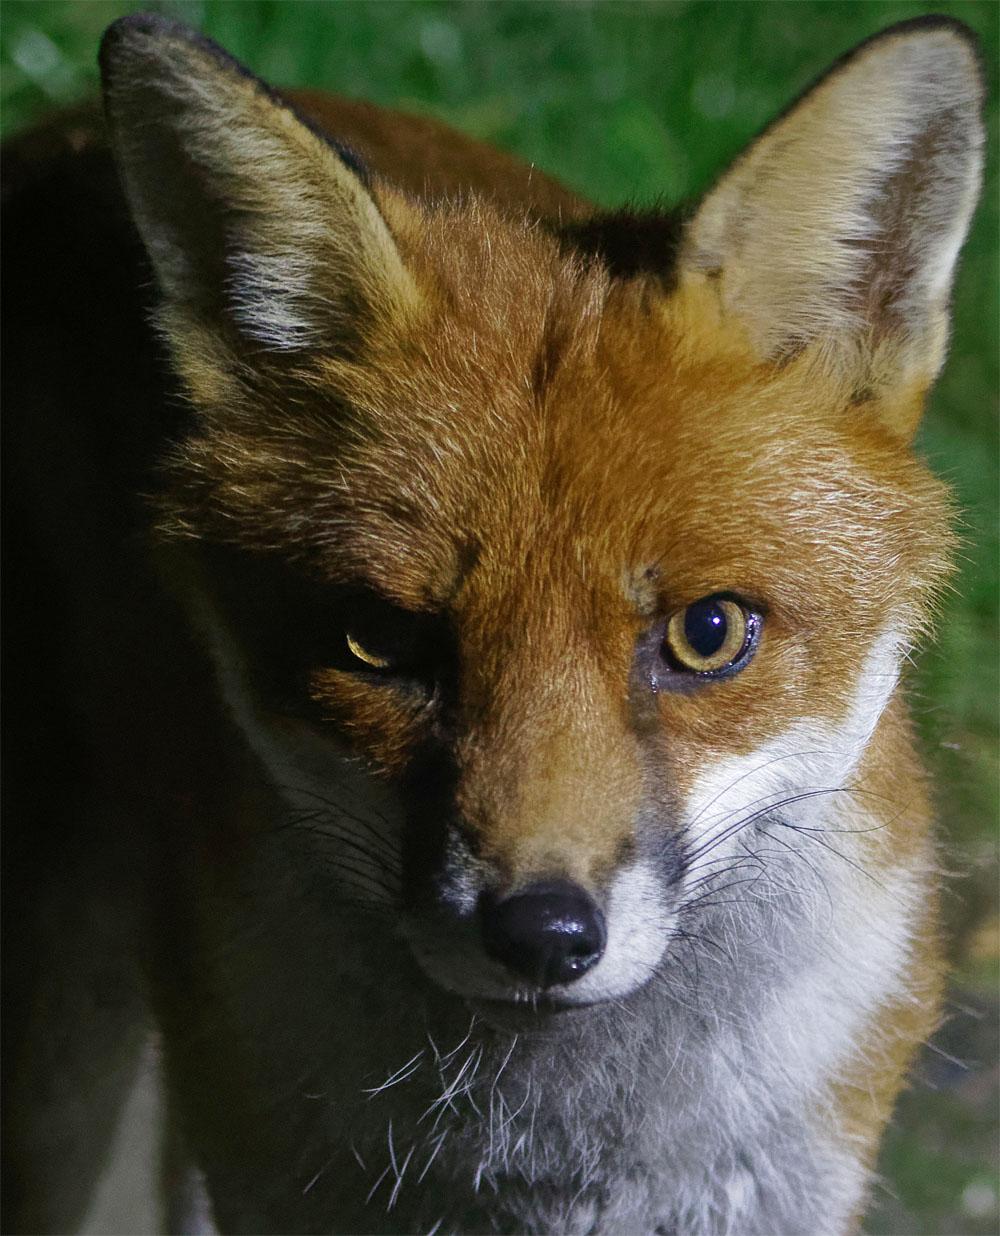 Fox intense 22 Aug 20